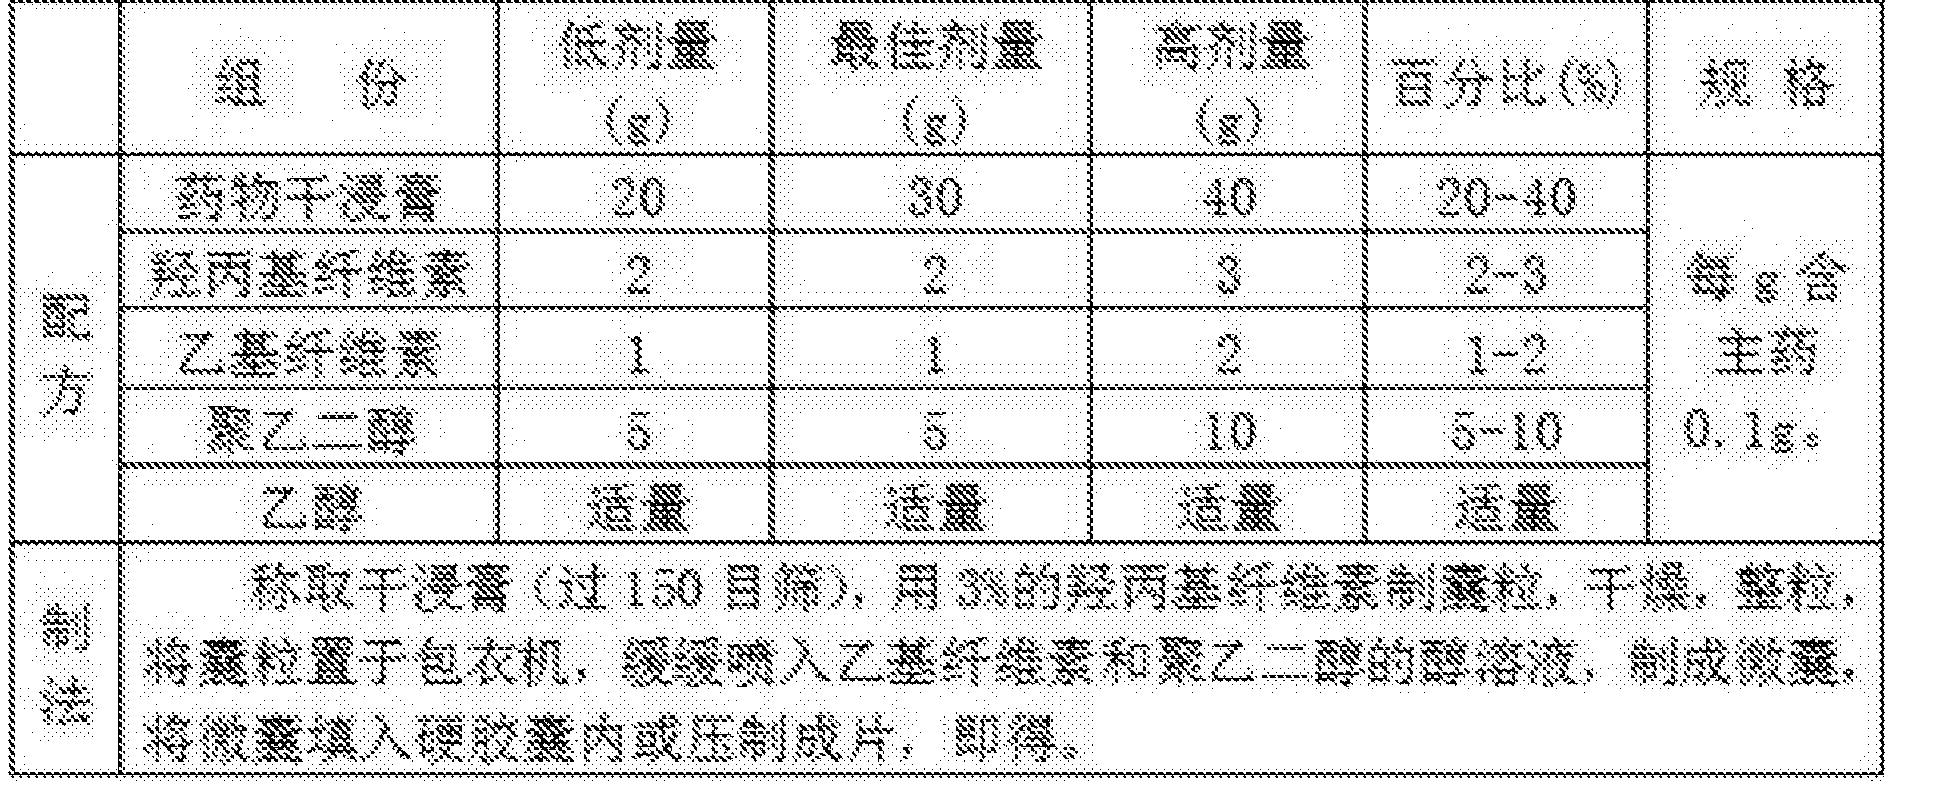 Figure CN107638448AD00113